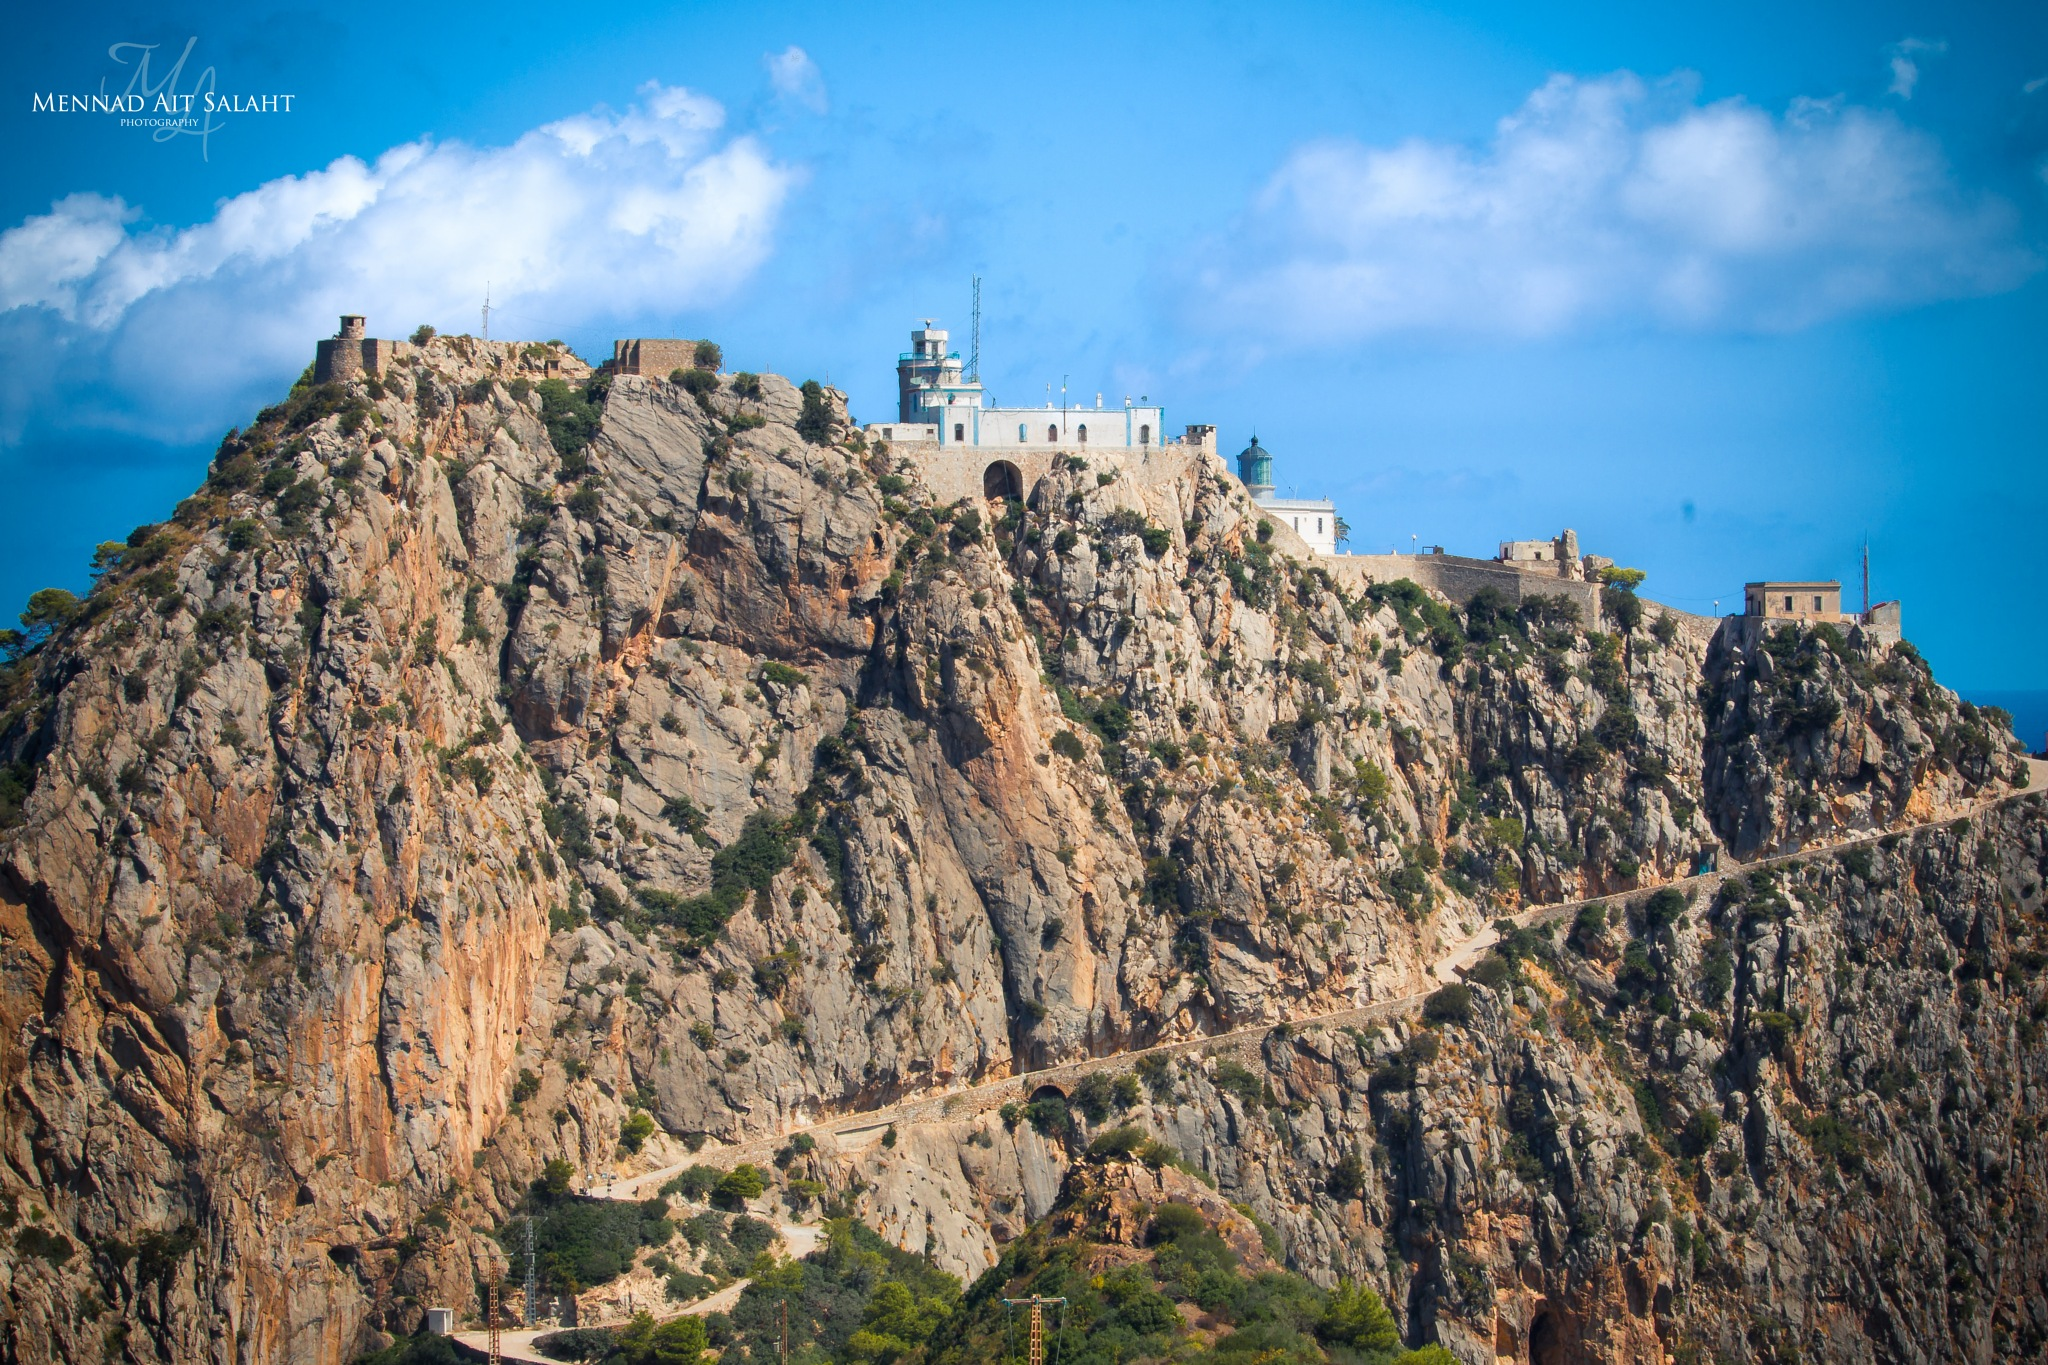 The Highest Natural Lighthouse in the World (242m), Cap Carbon, Bejaia (Algeria) by Mennad AIT SALAHT